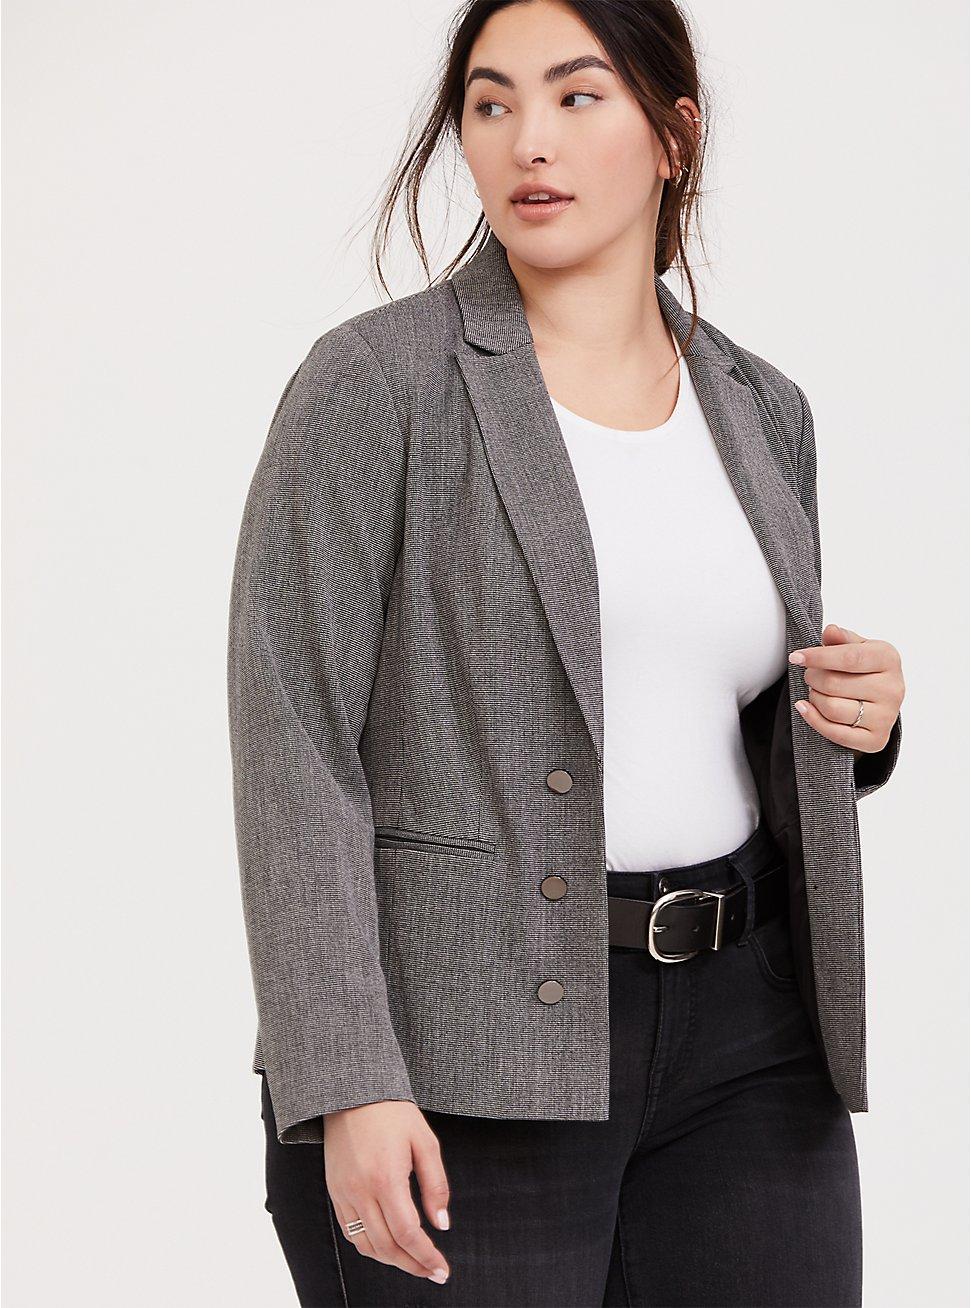 Black & White Tweed Textured Blazer, DARK PEARL GREY, hi-res